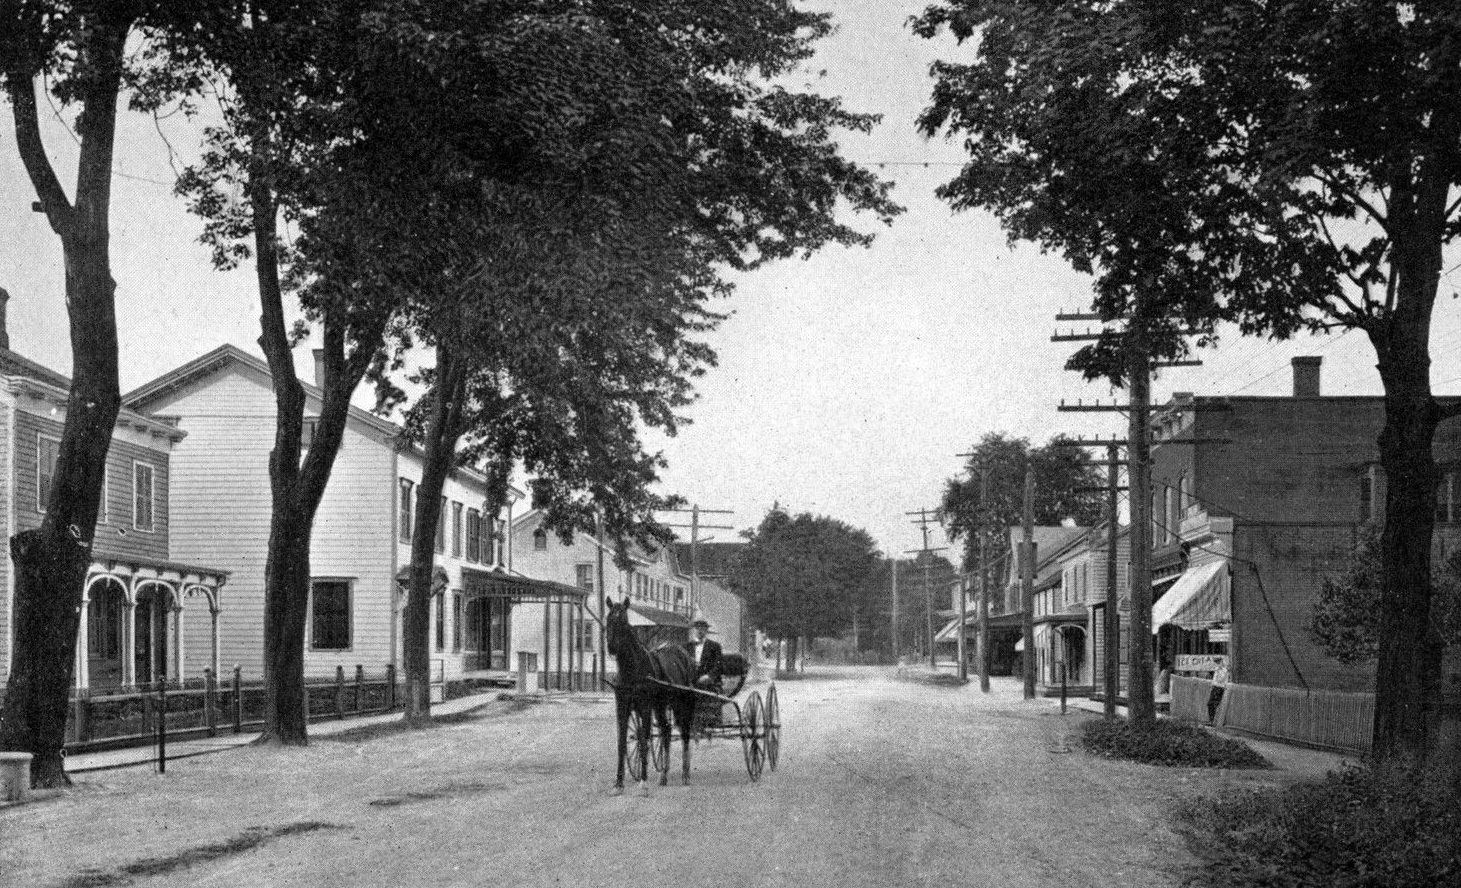 Broadway-in-Port-Ewen-NY-Ulster-County